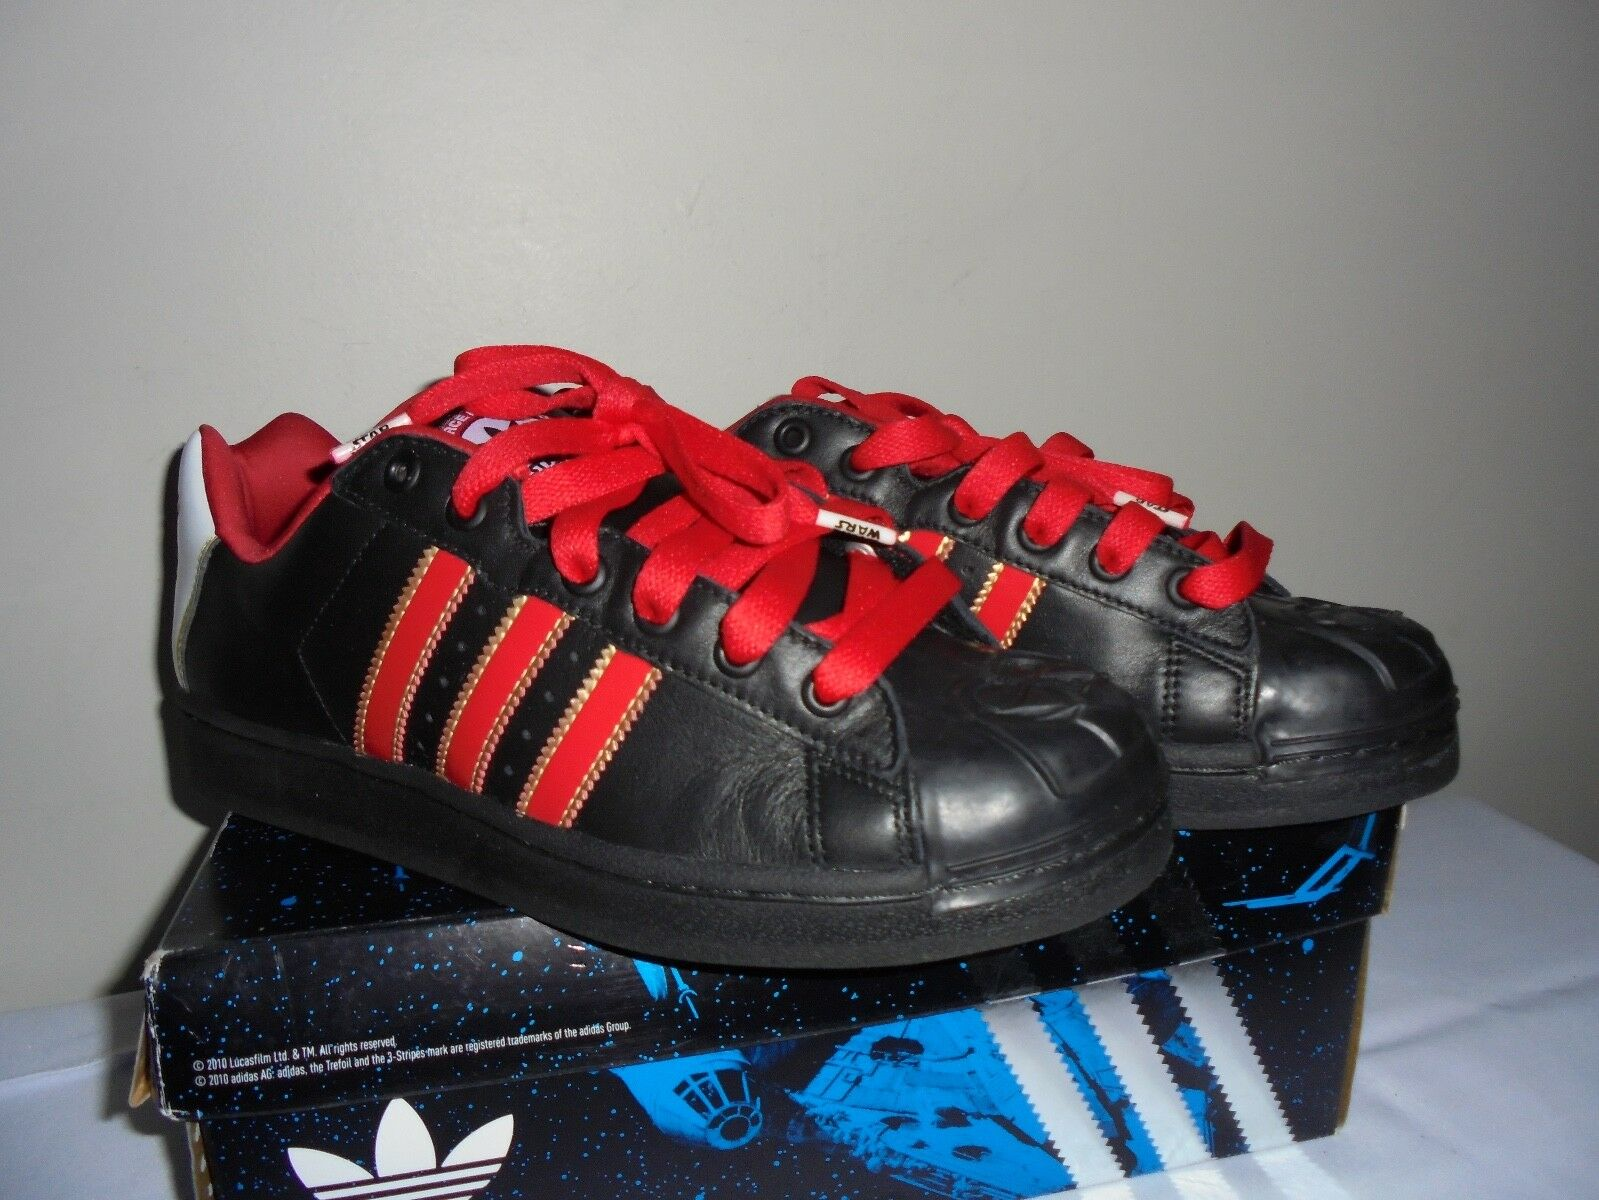 Star wars adidas ultrastar p.l. 8 dart fener usa 8 p.l. scarpe scarpe da ginnastica new w box fcea02